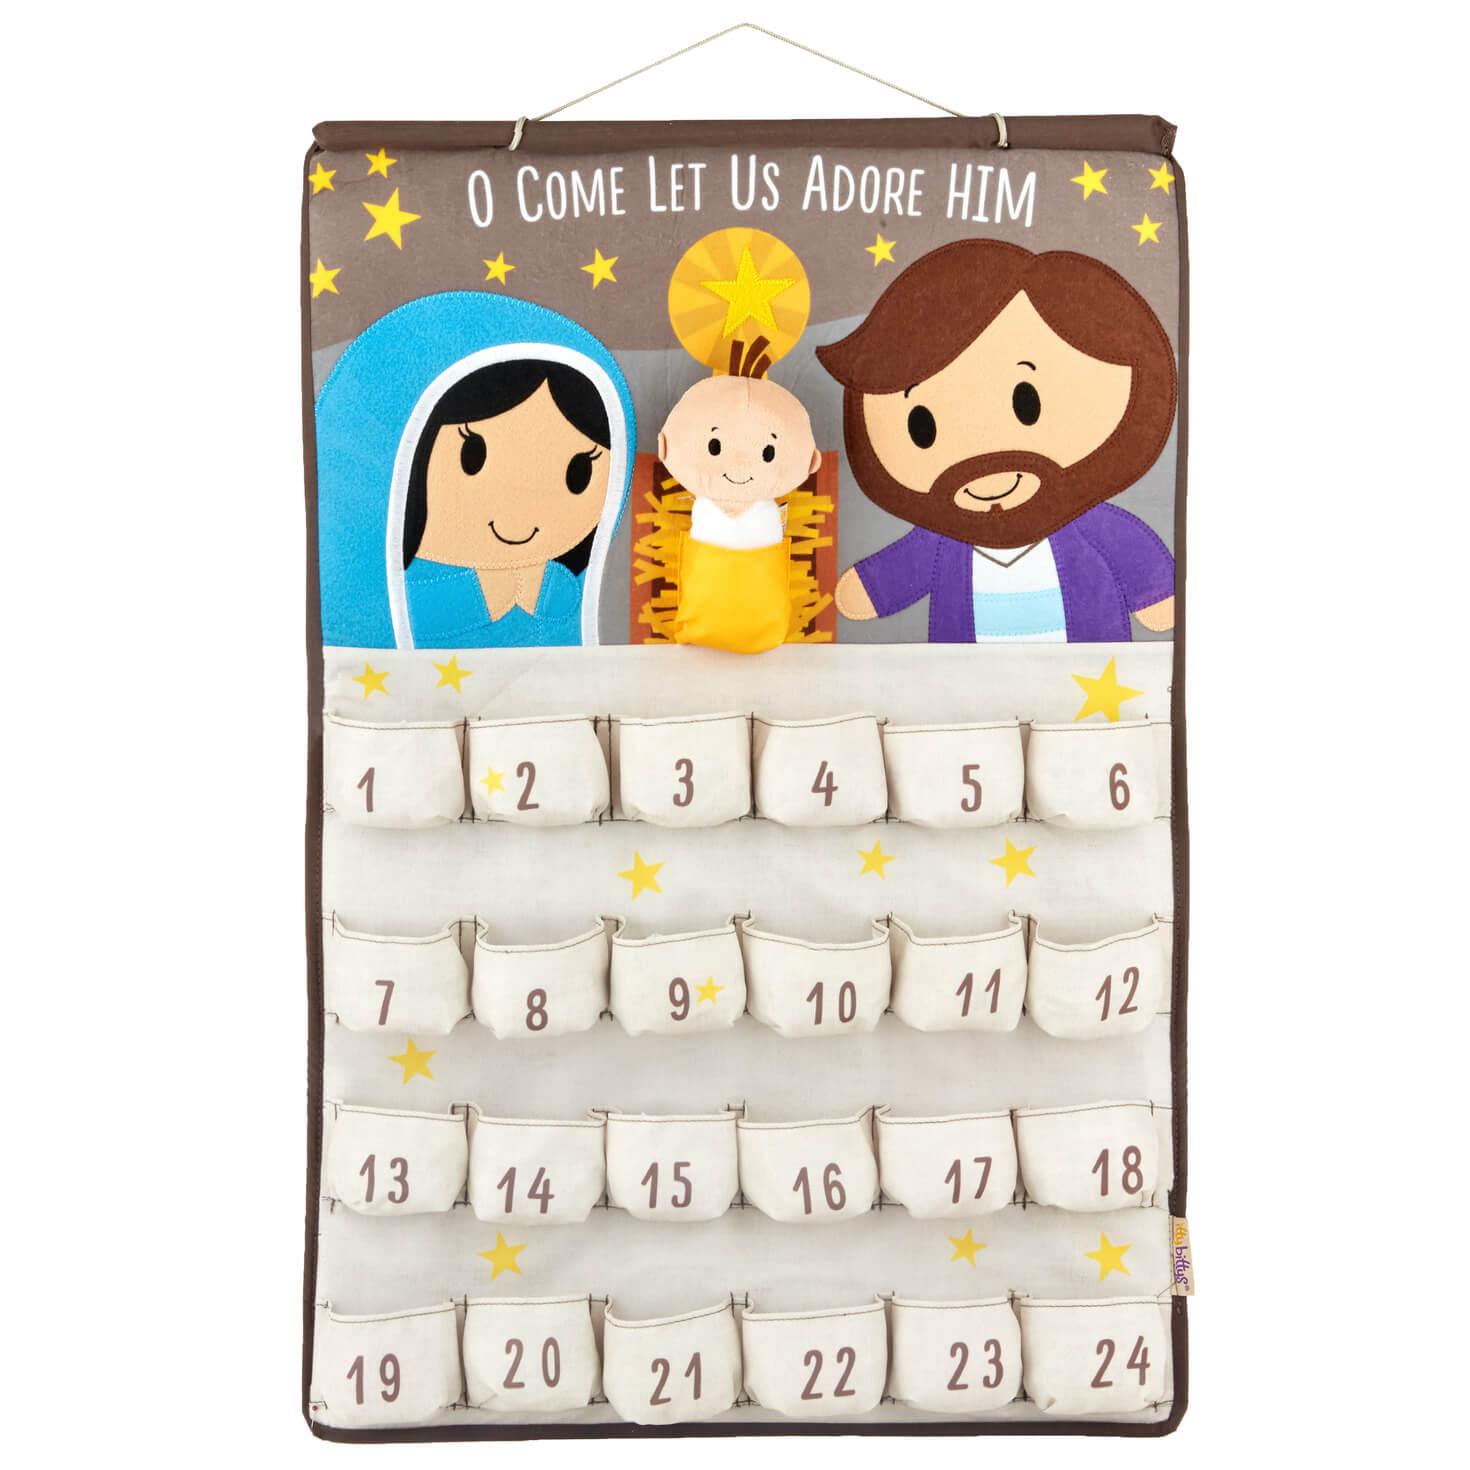 Itty Bittys® Jesus Plush Countdown To Jesus'S Birthday Calendarhallmark within Free Hallmark Pocket Calendars